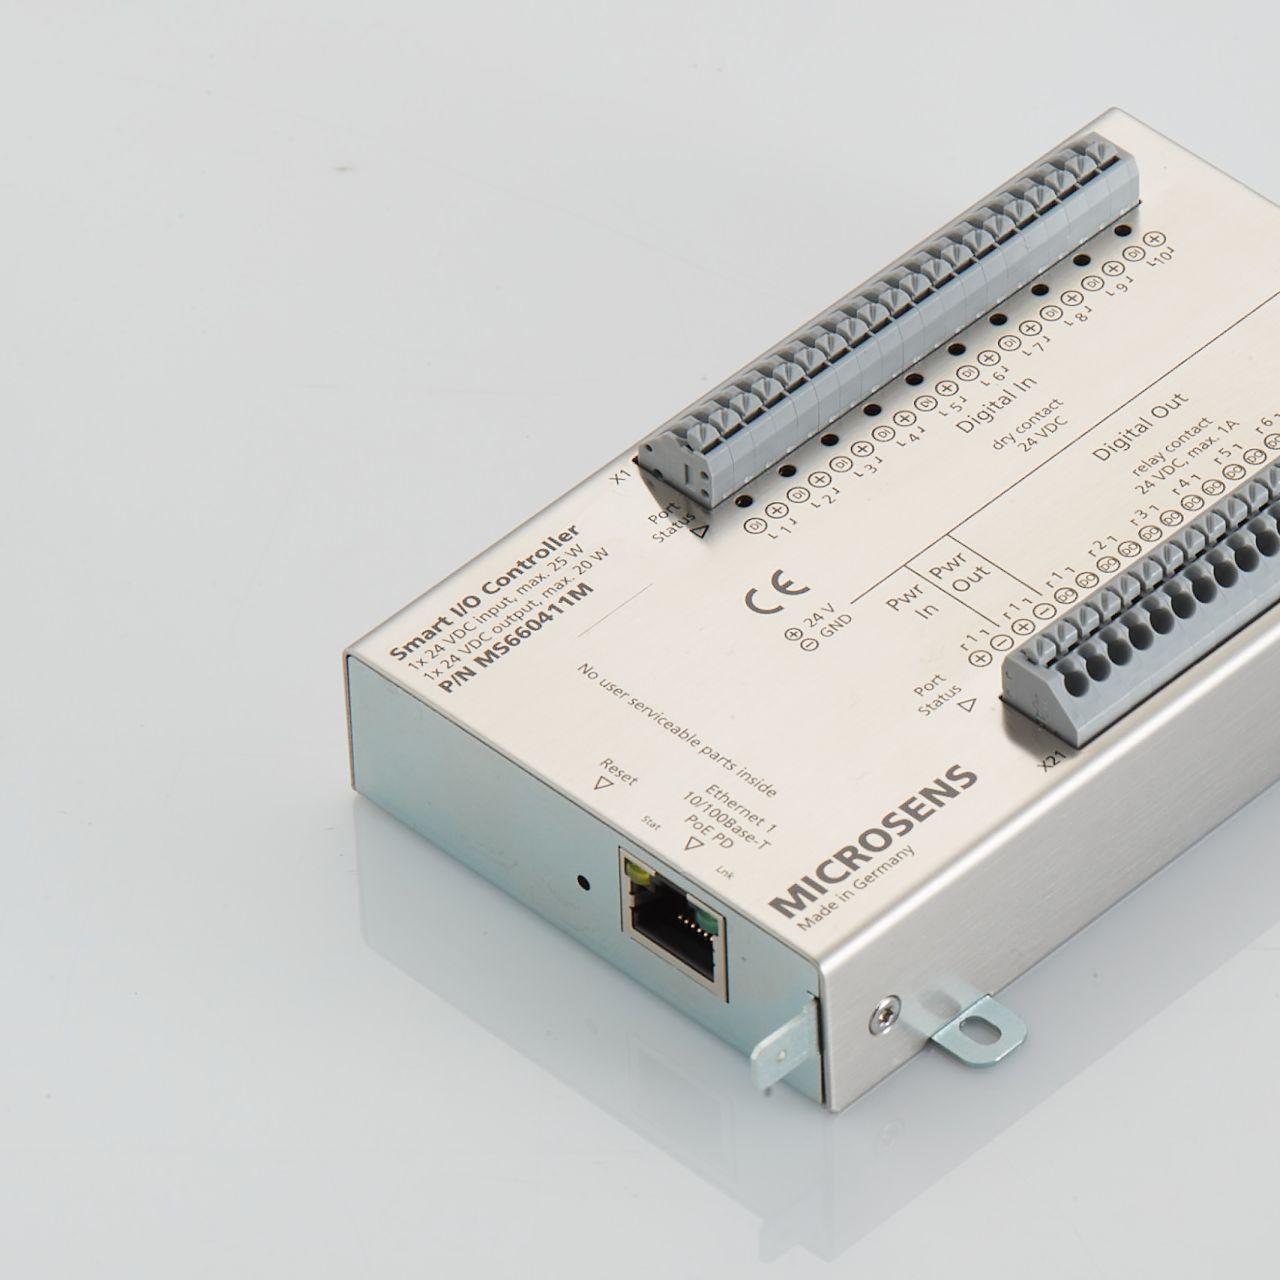 Microsens: Neuer Smart I/O Controller